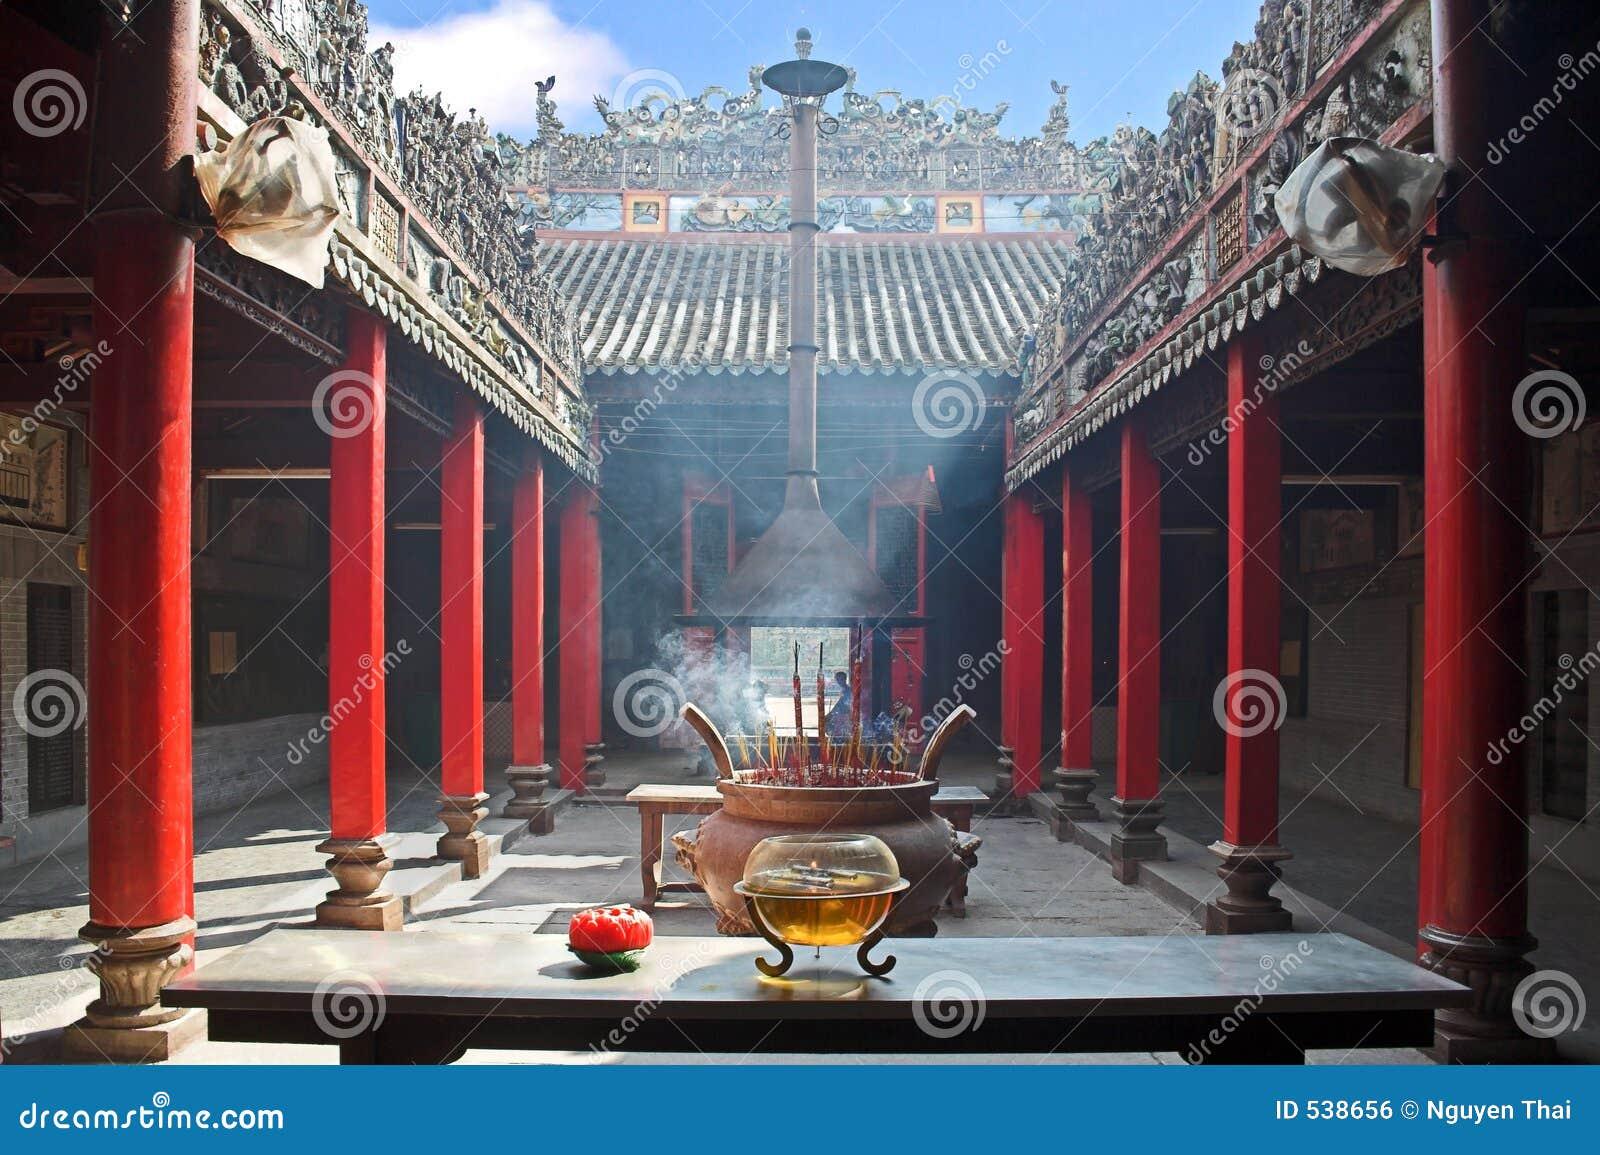 Temple Smoke-filled